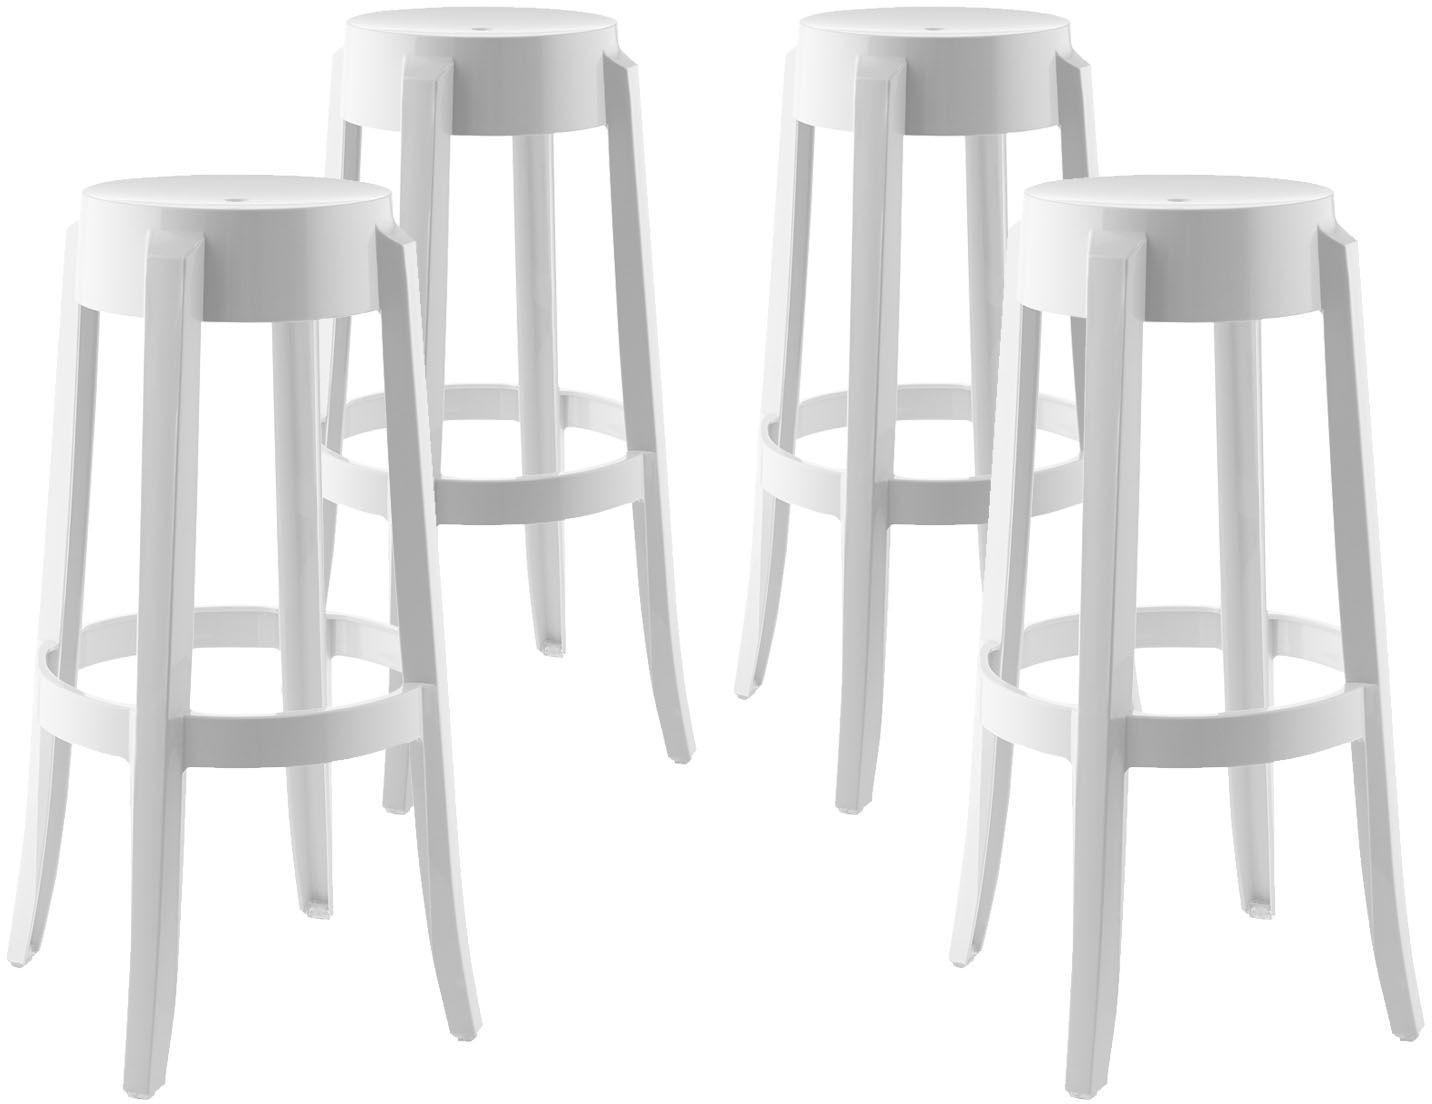 Casper White Bar Stool Set of 4 EEI 1680 WHI Renegade  : eei 1680 whi1eei from colemanfurniture.com size 1432 x 1104 jpeg 89kB